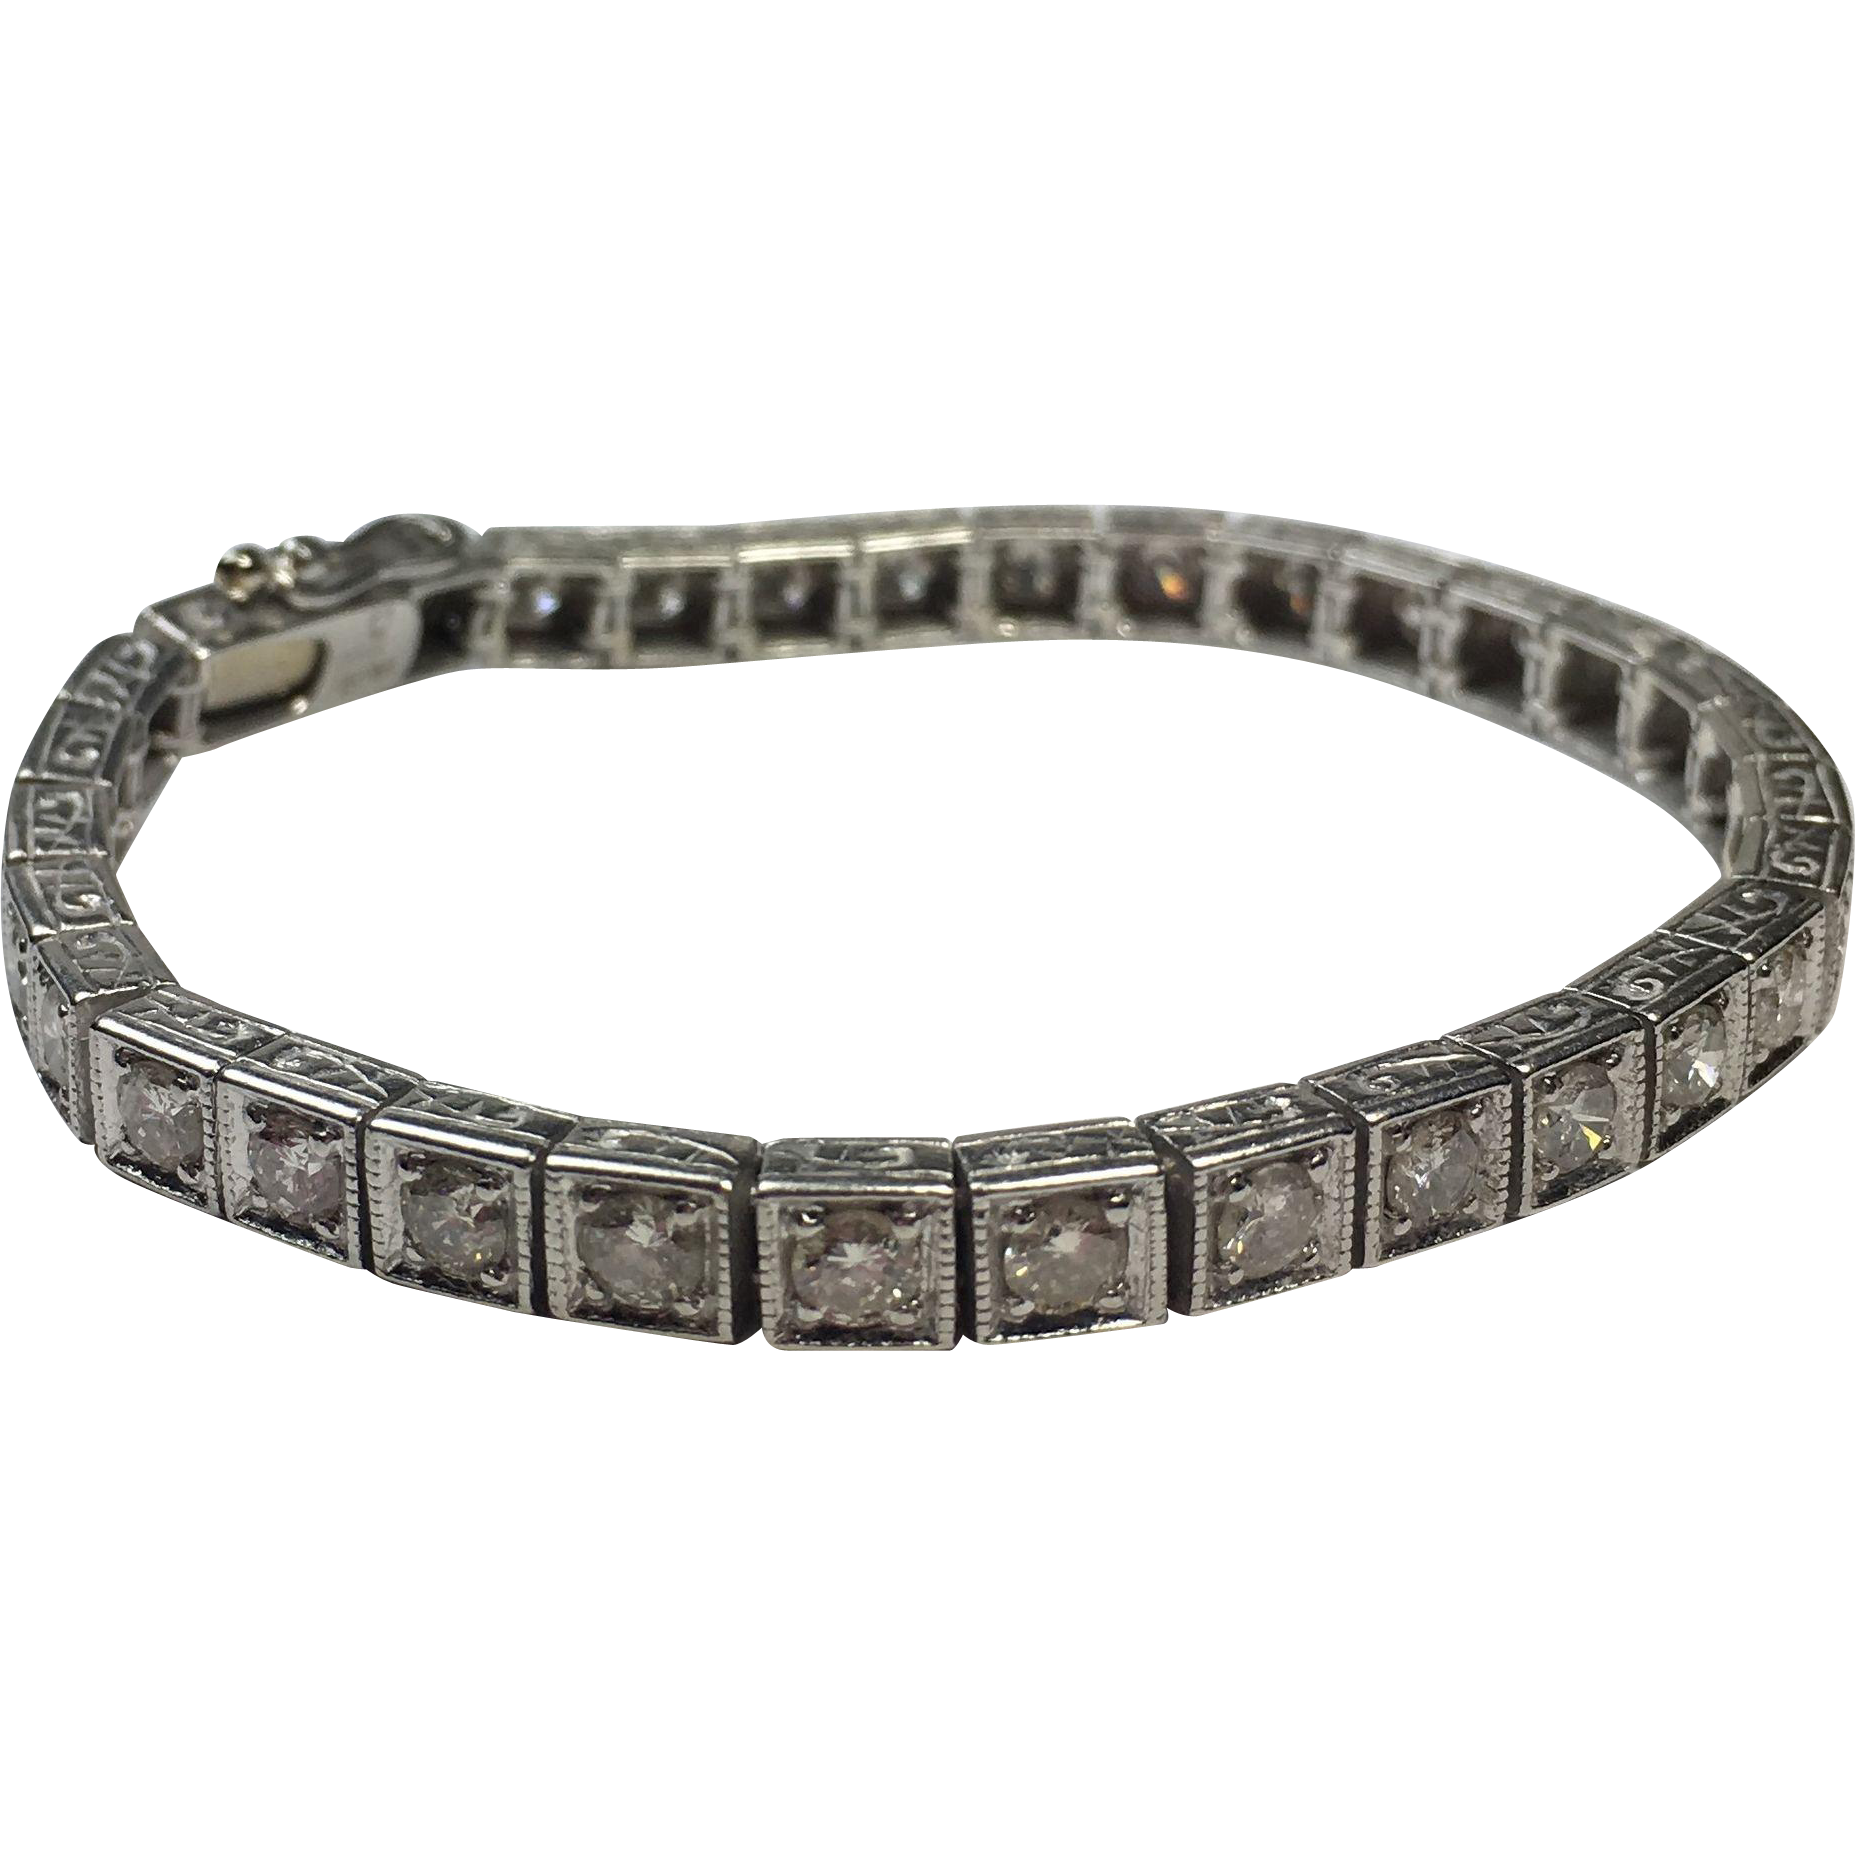 Vintage 4.00 TCW Round Brilliant Diamond Tennis Bracelet on Platinum